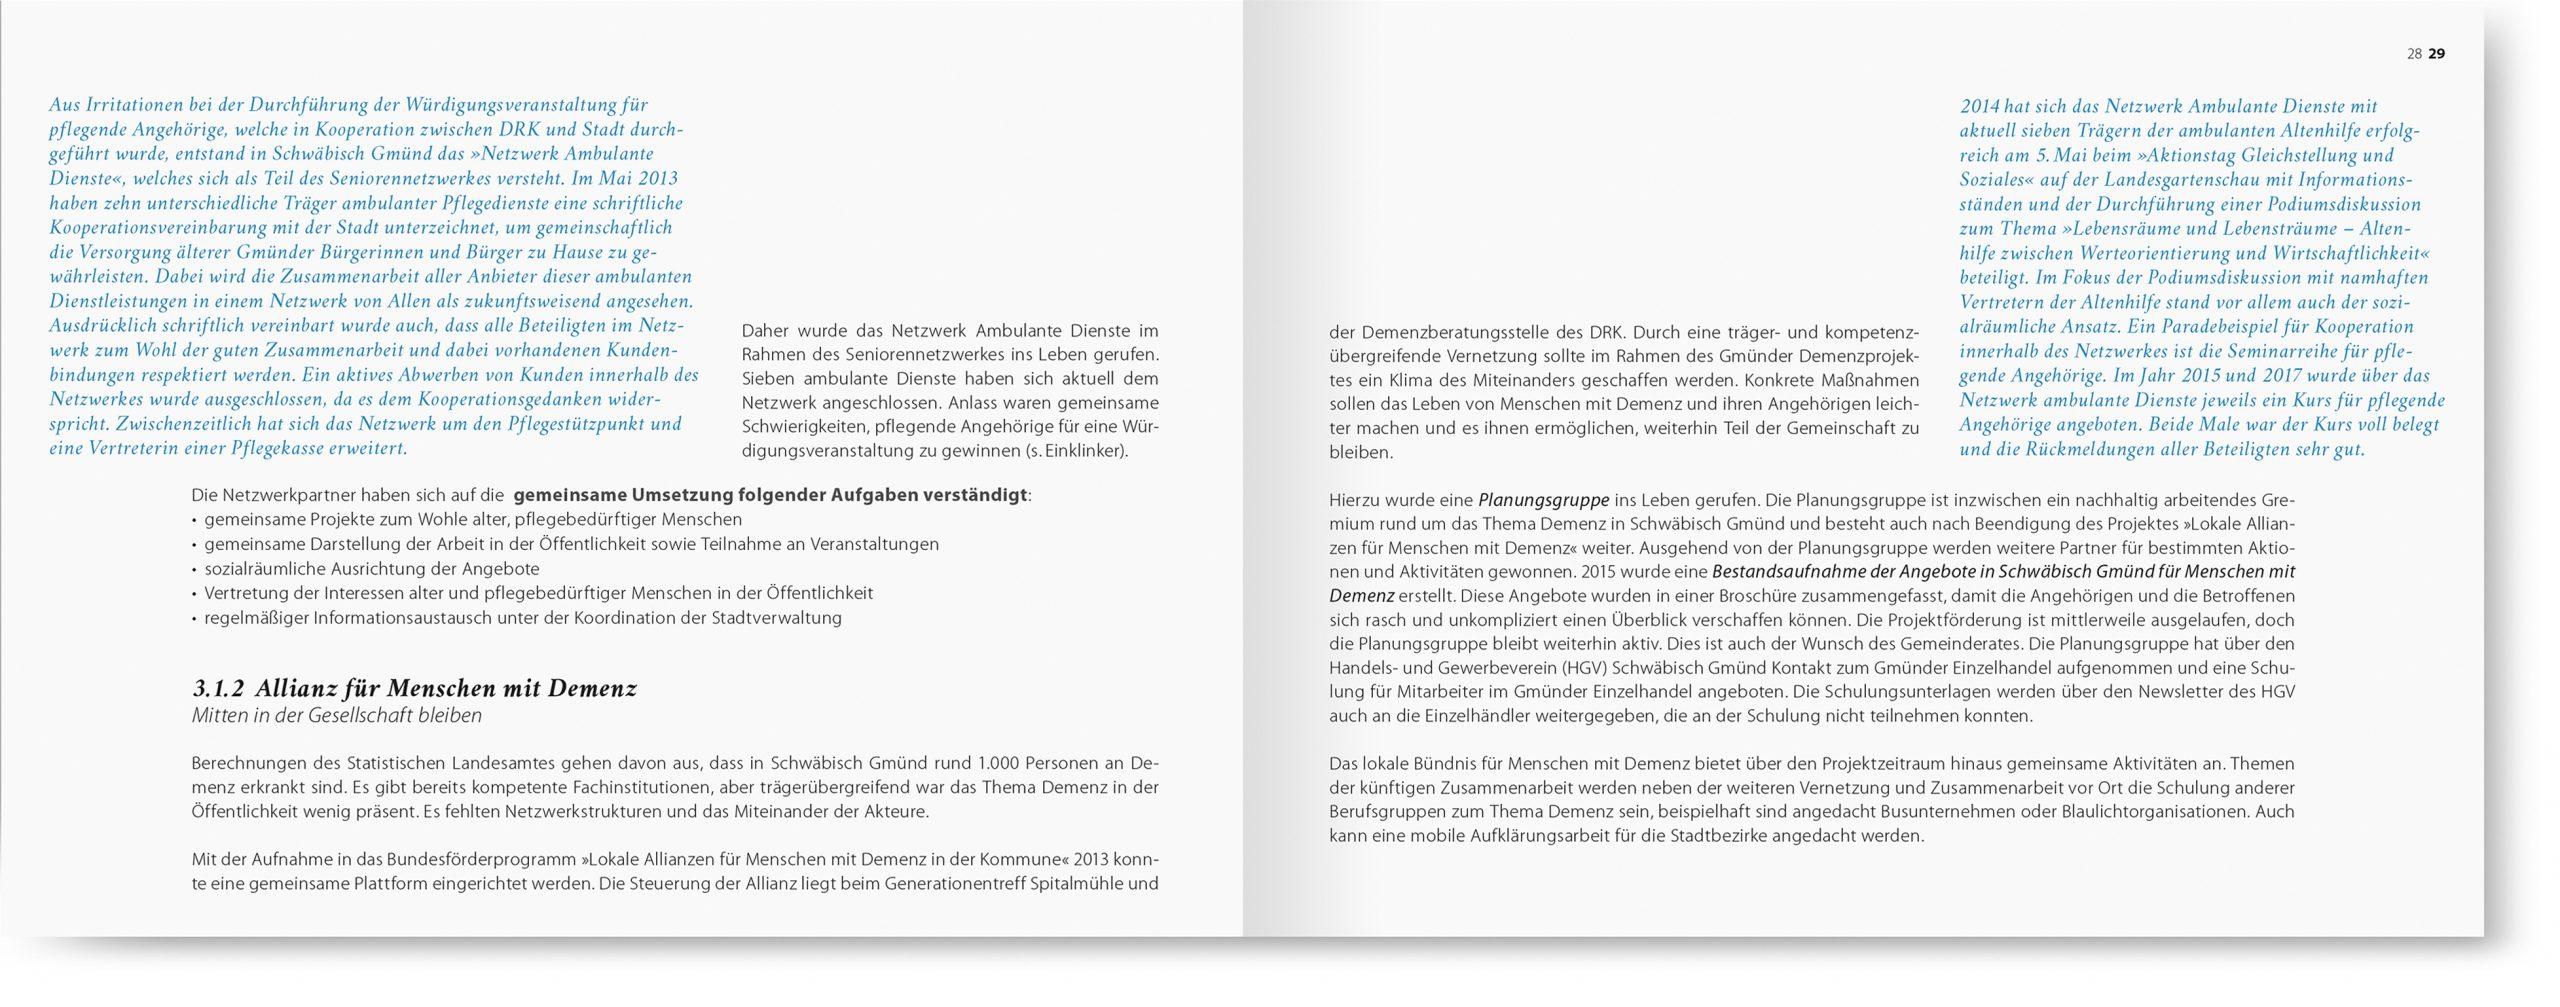 fh-web-seniorenkonzeption-5-scaled.jpg